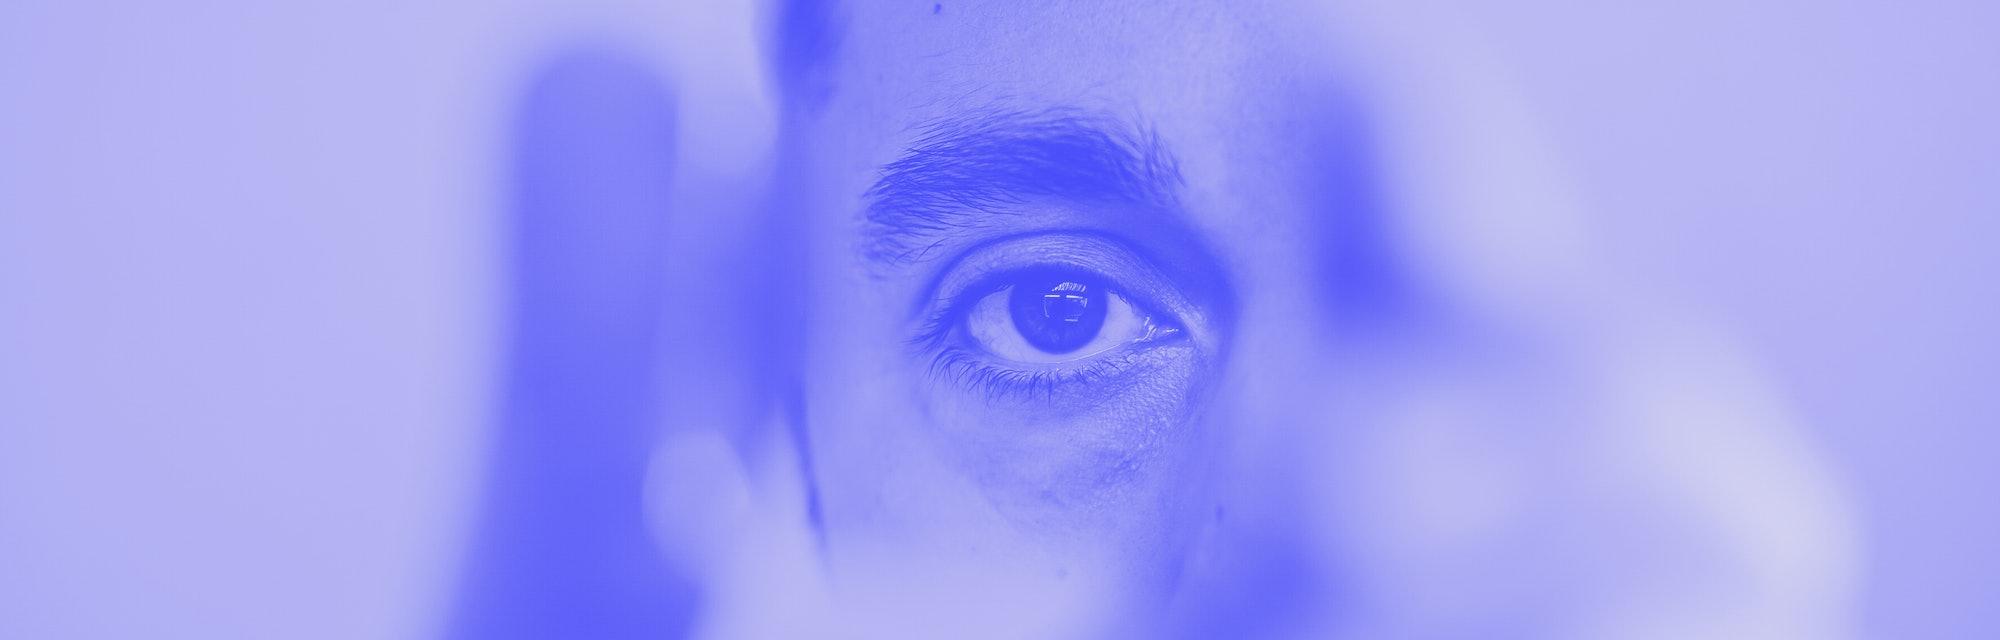 man looking in mirror photo illustration